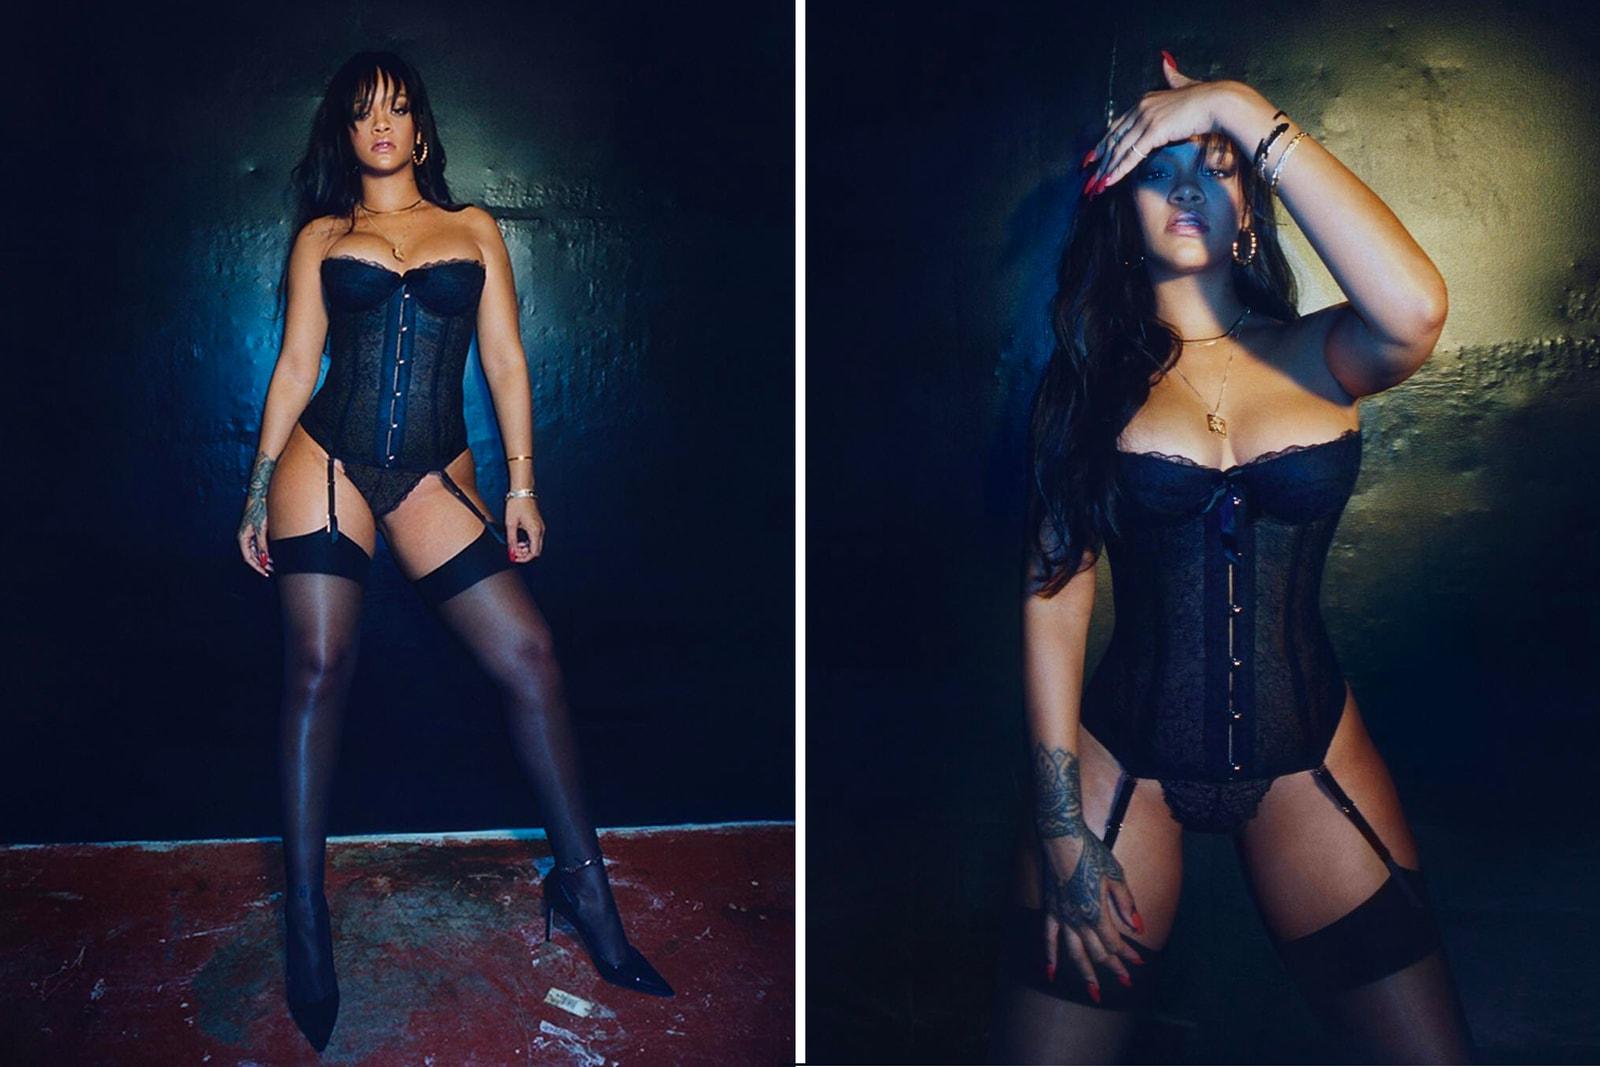 Rihanna Savage X Fenty Lingerie Underwear Bra Pink Denim Jacket May 11 Sizing Price International Shipping